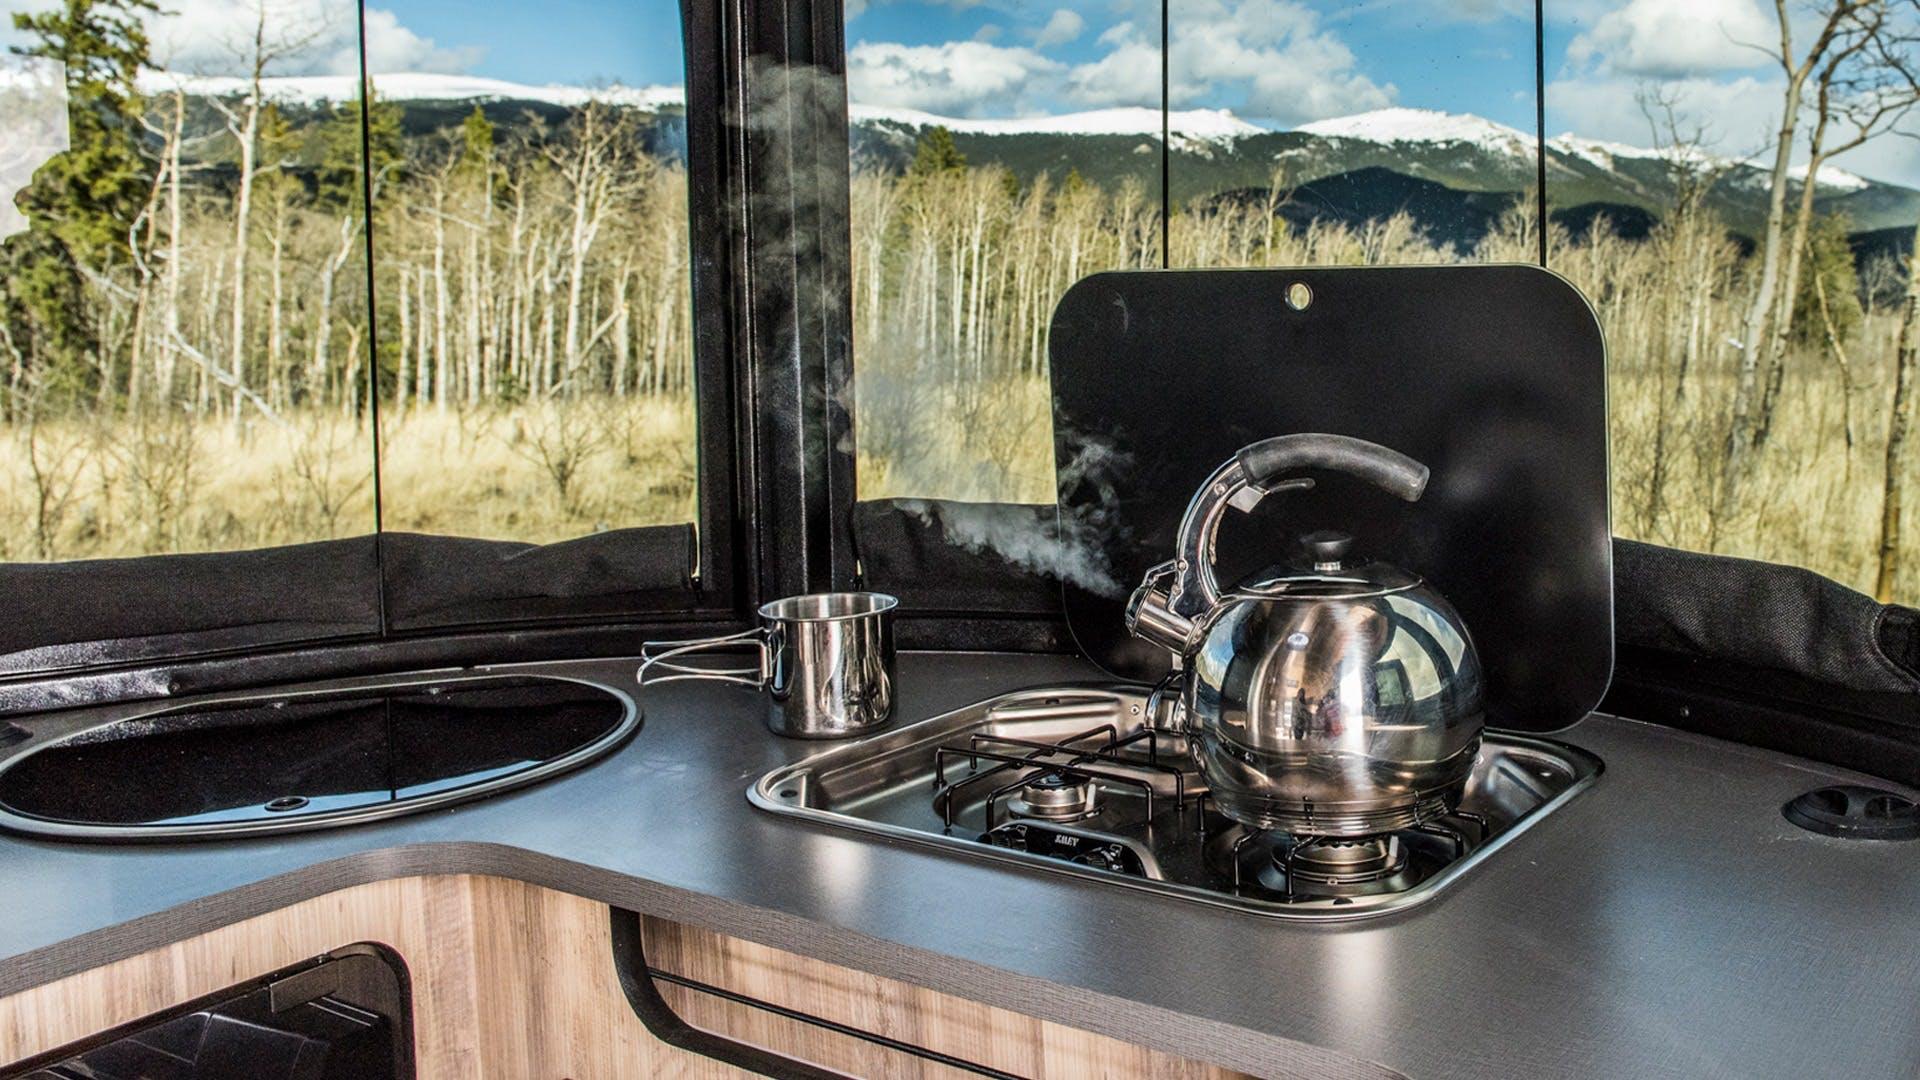 Basecamp-Sub-Features-SimpleContent-Kitchen-2-SinkStove